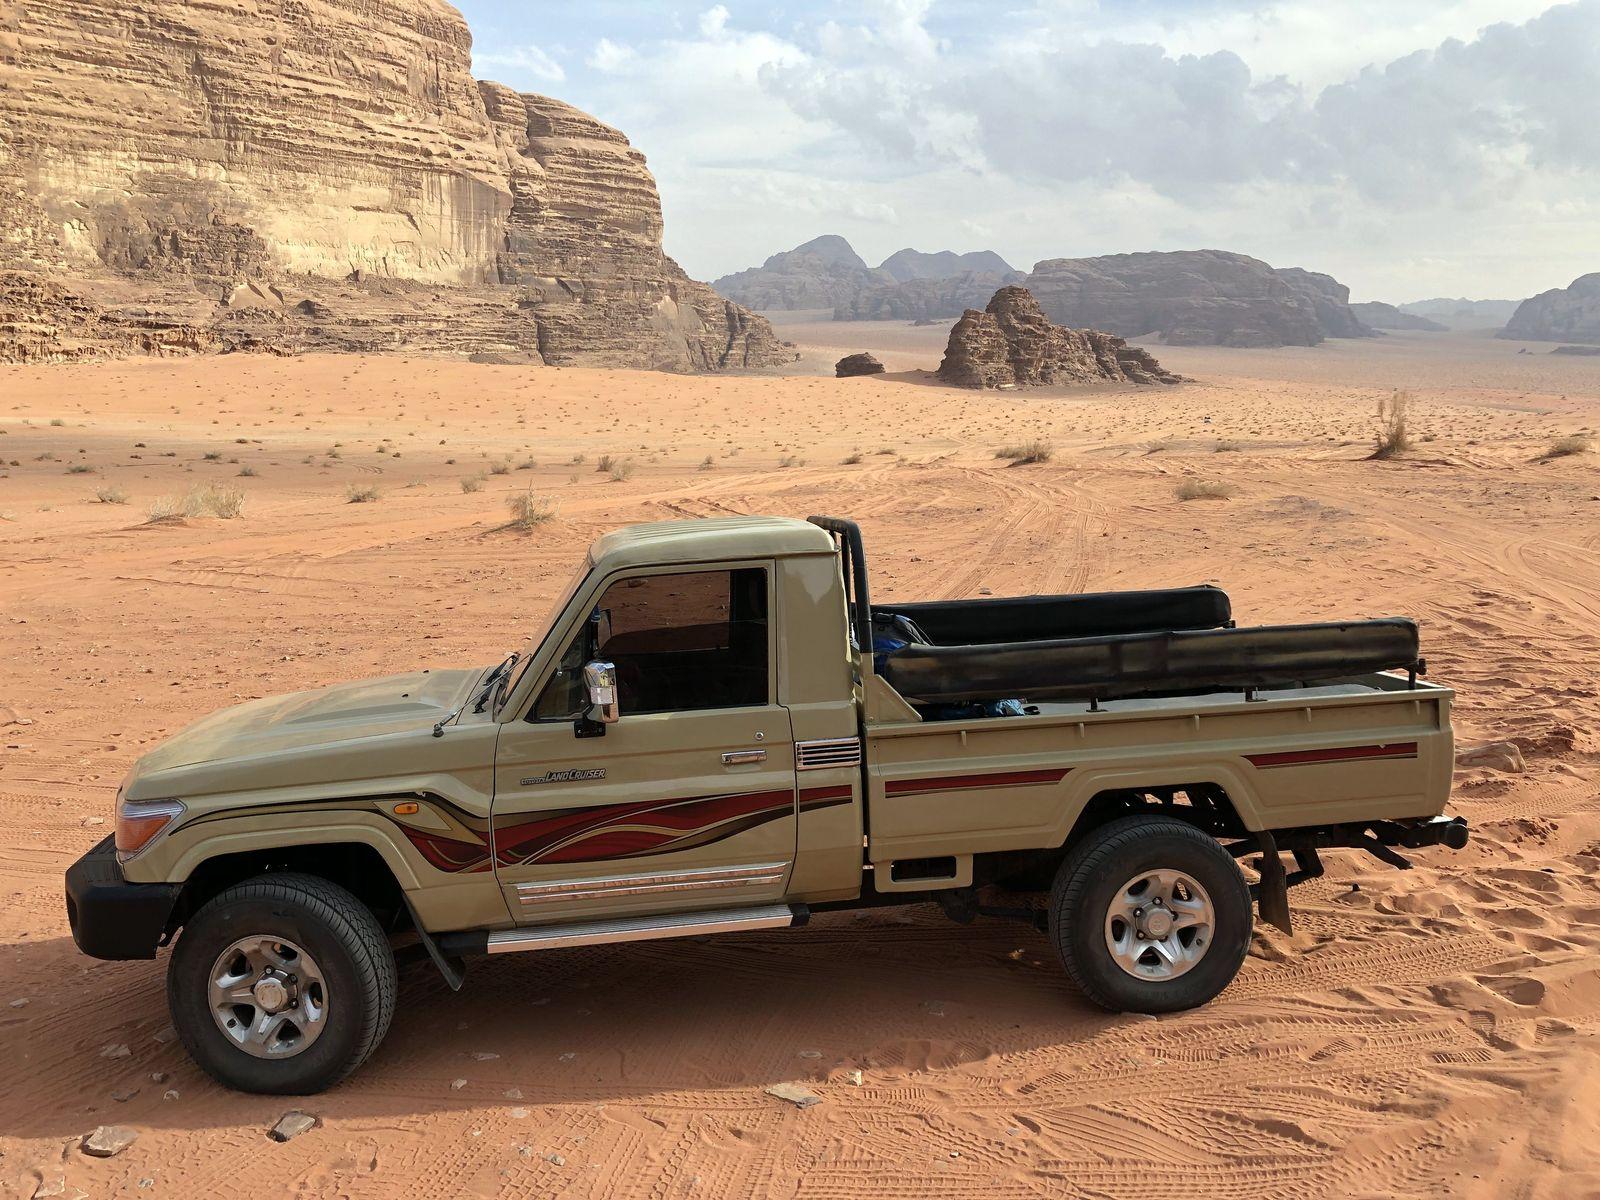 18 Jordánsko Wadi Rum